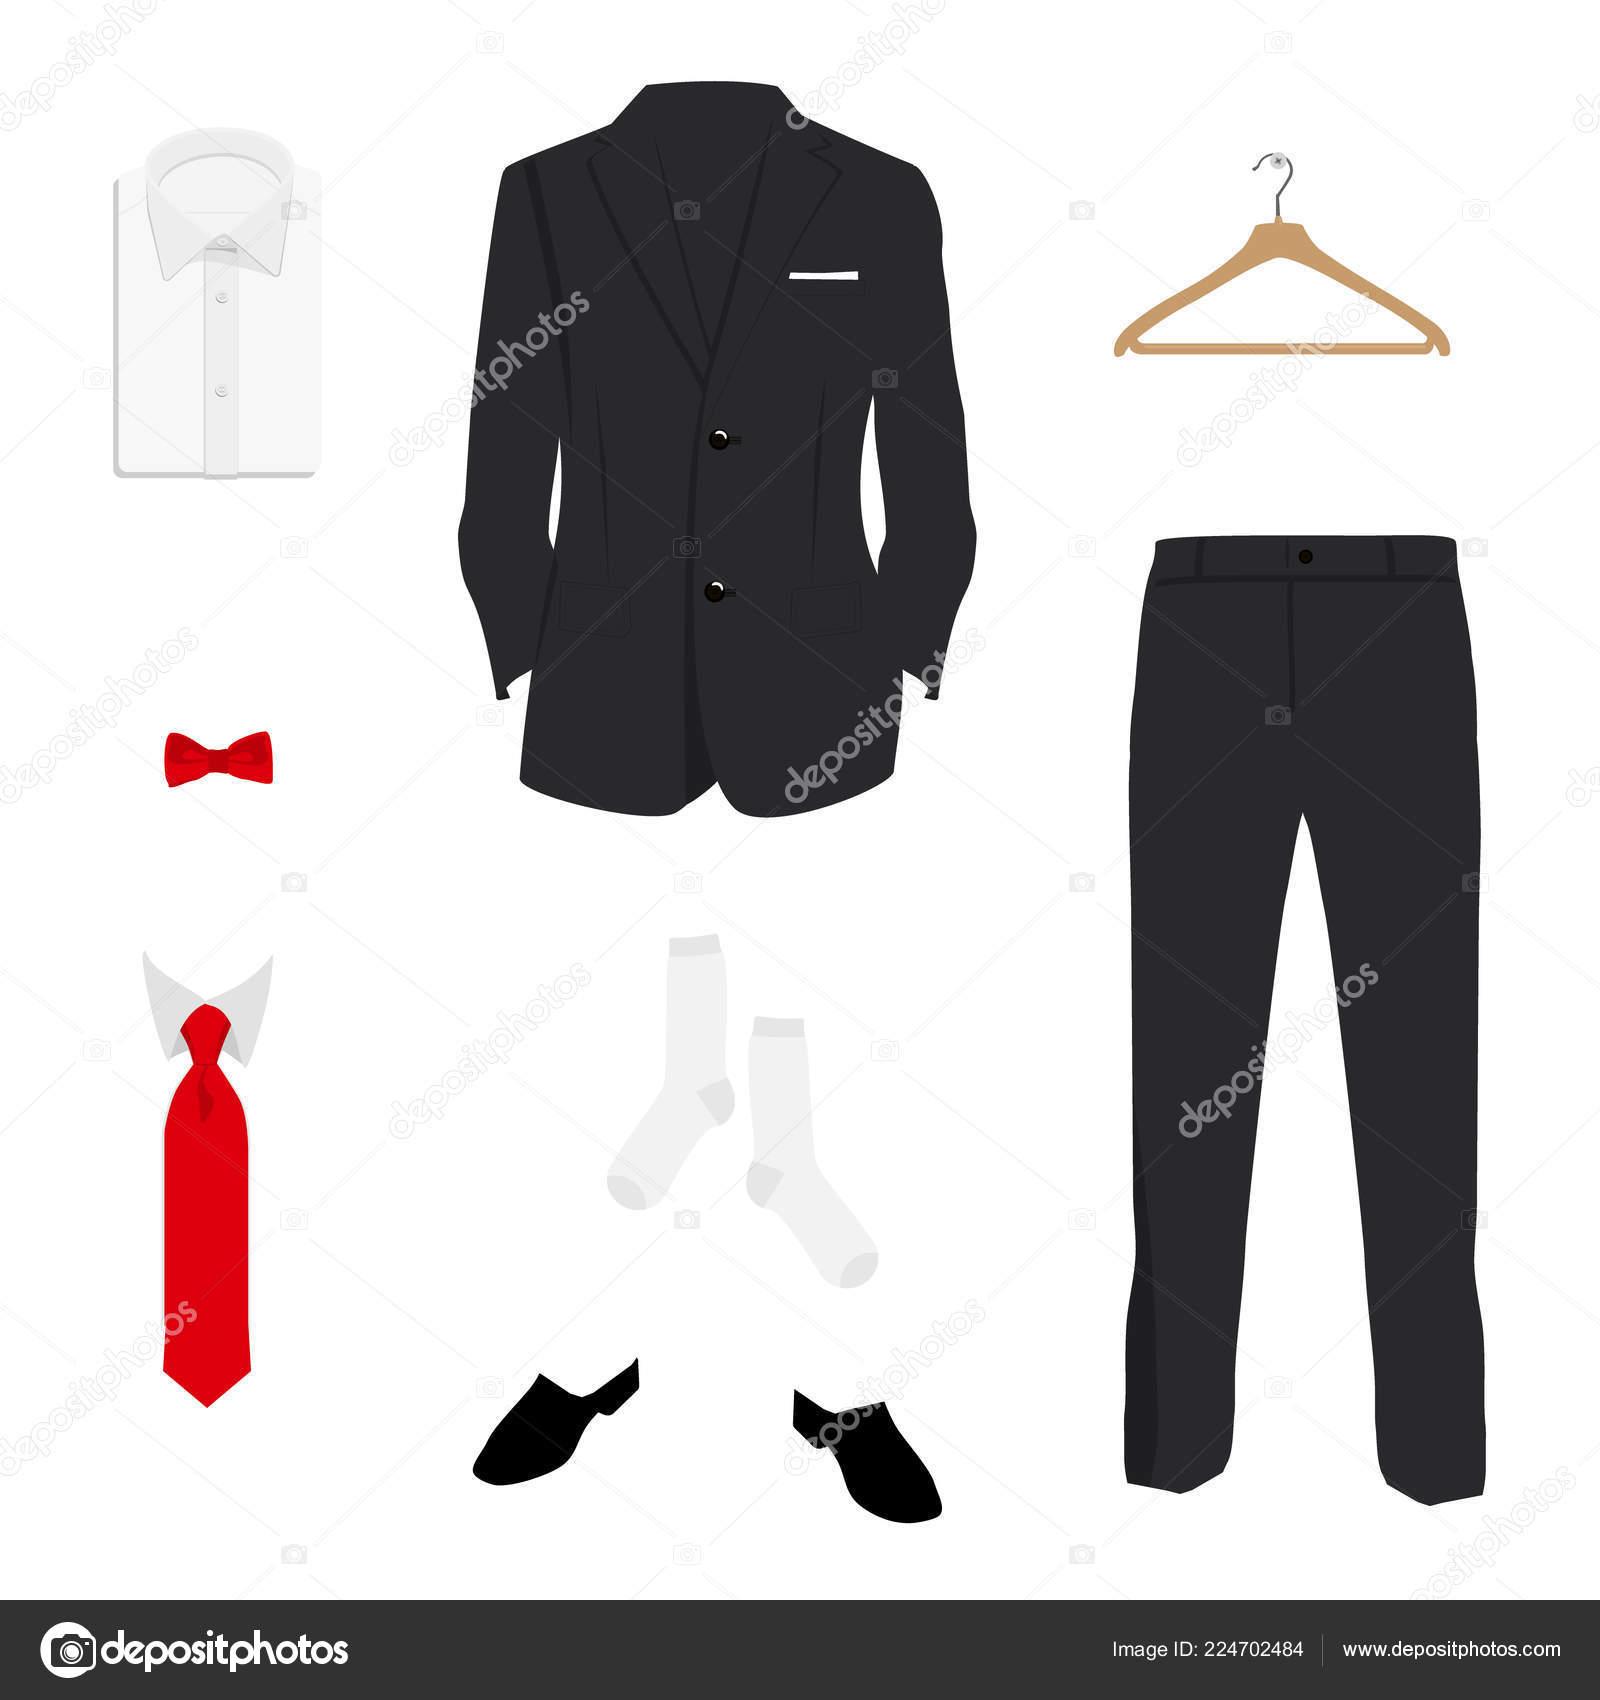 71960a4b Vector Illustration Elegant Men Fashion Suit Uniform Jacket Pants Shirt —  Stock Vector